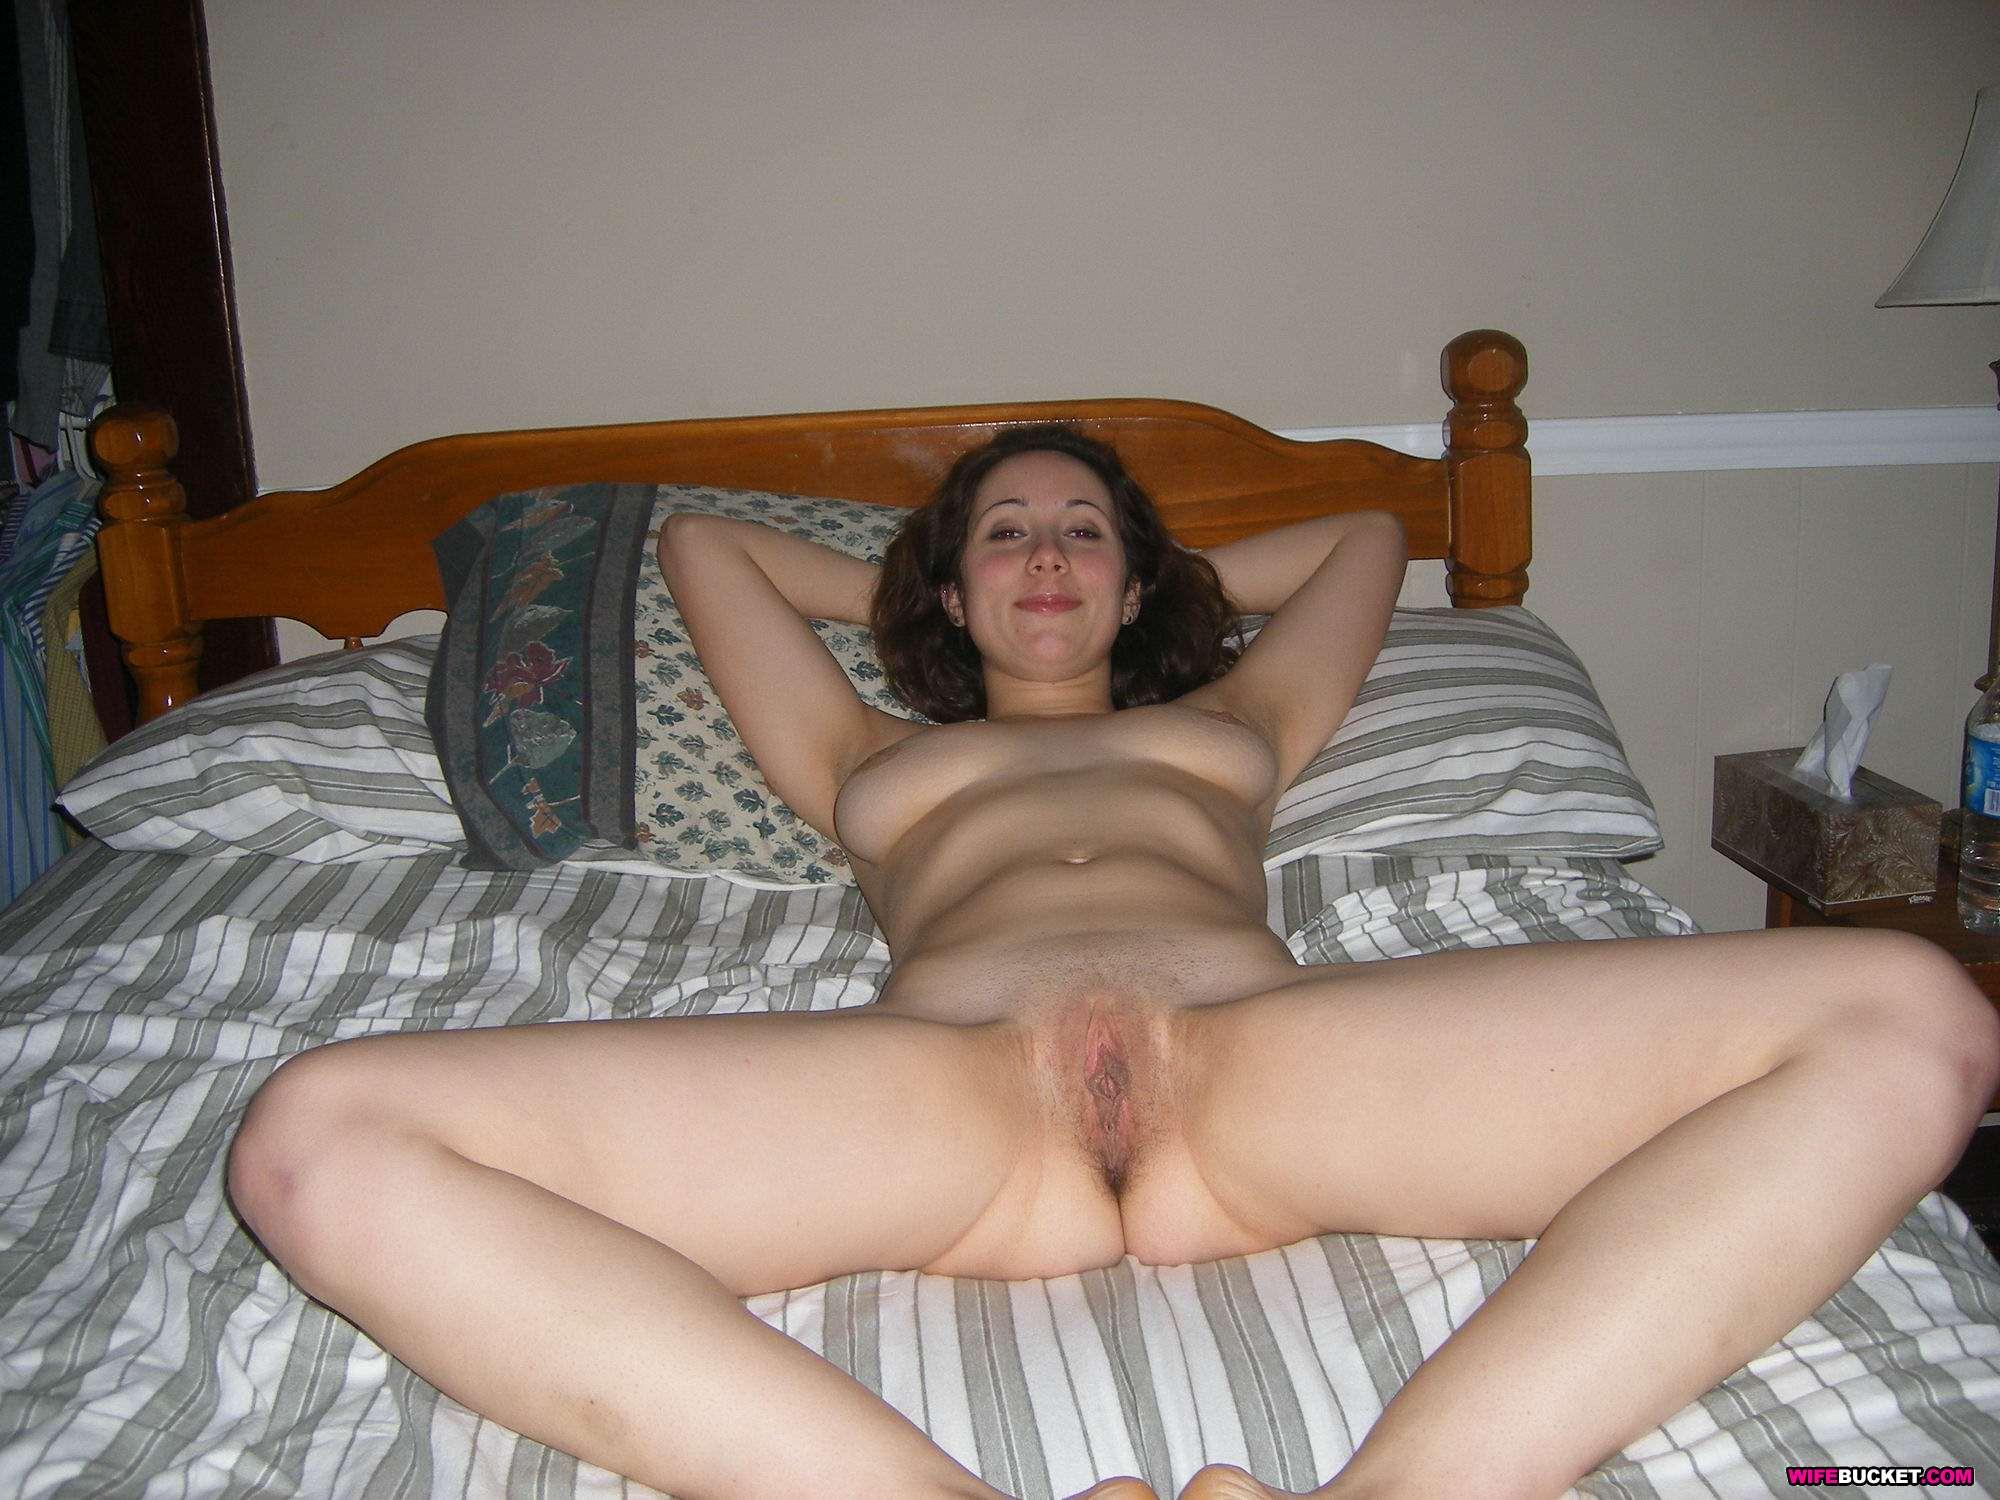 Chubby swinger sex porn video